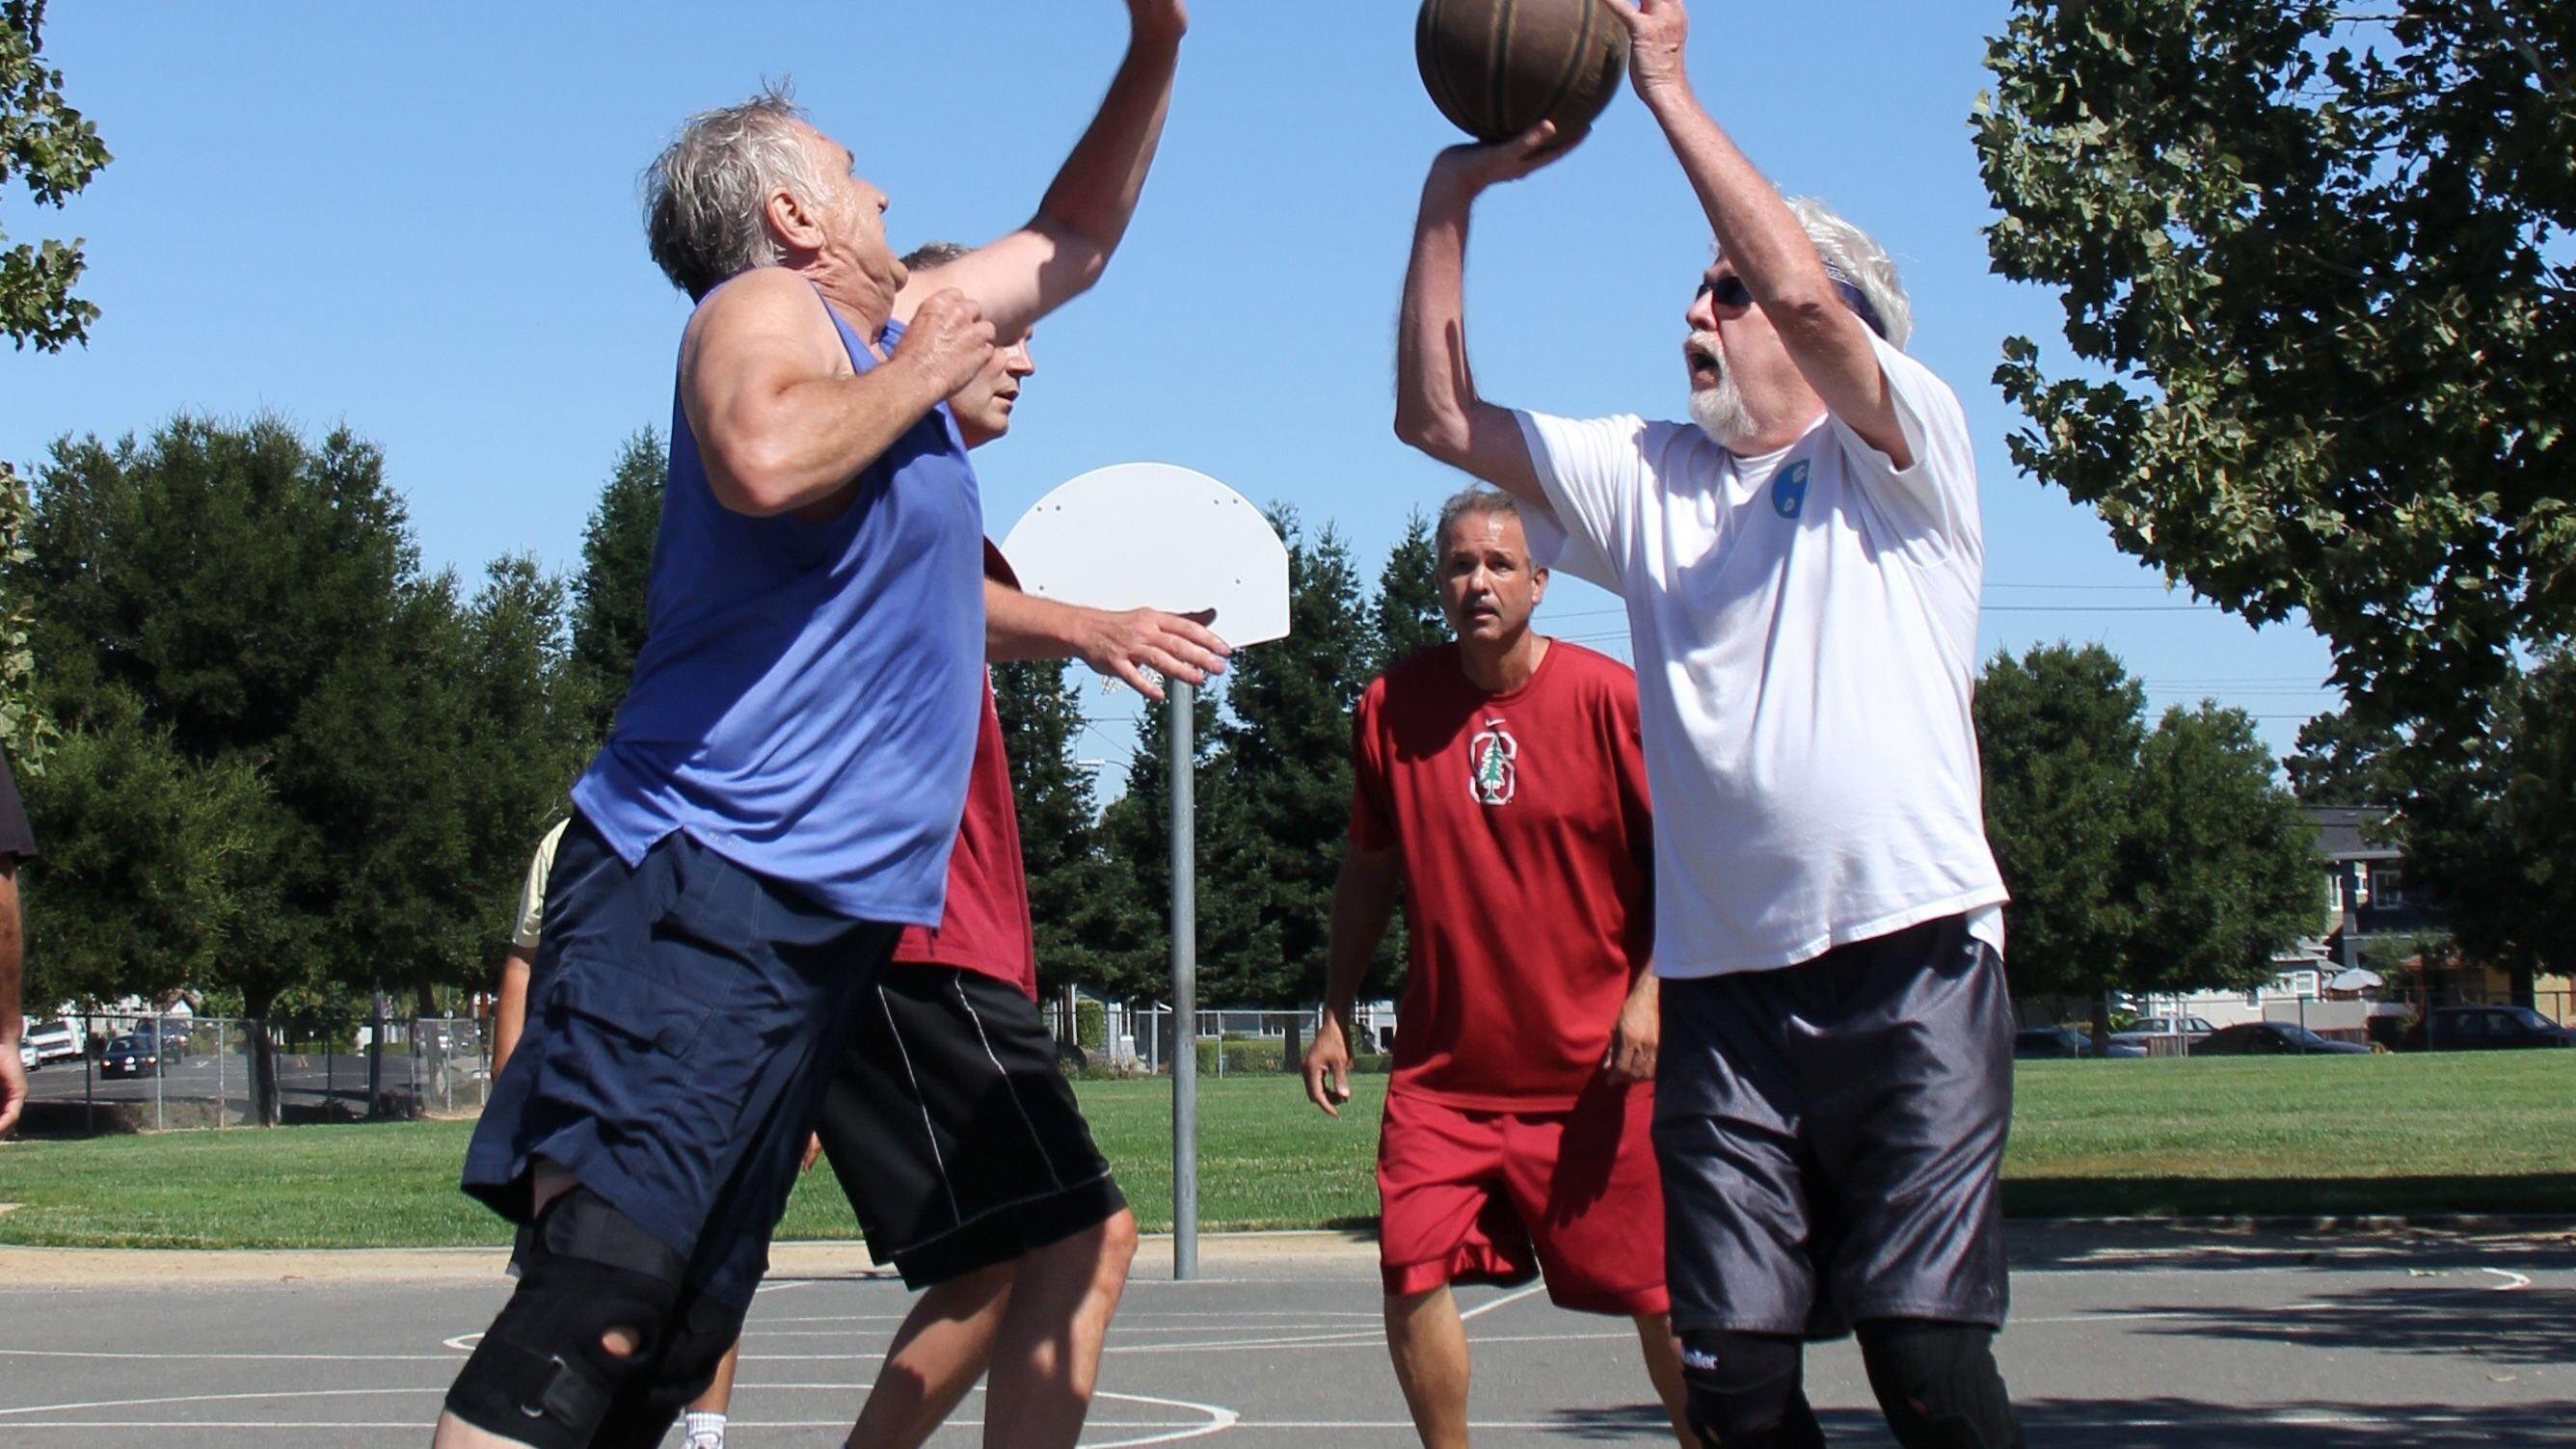 Old Man Basketball